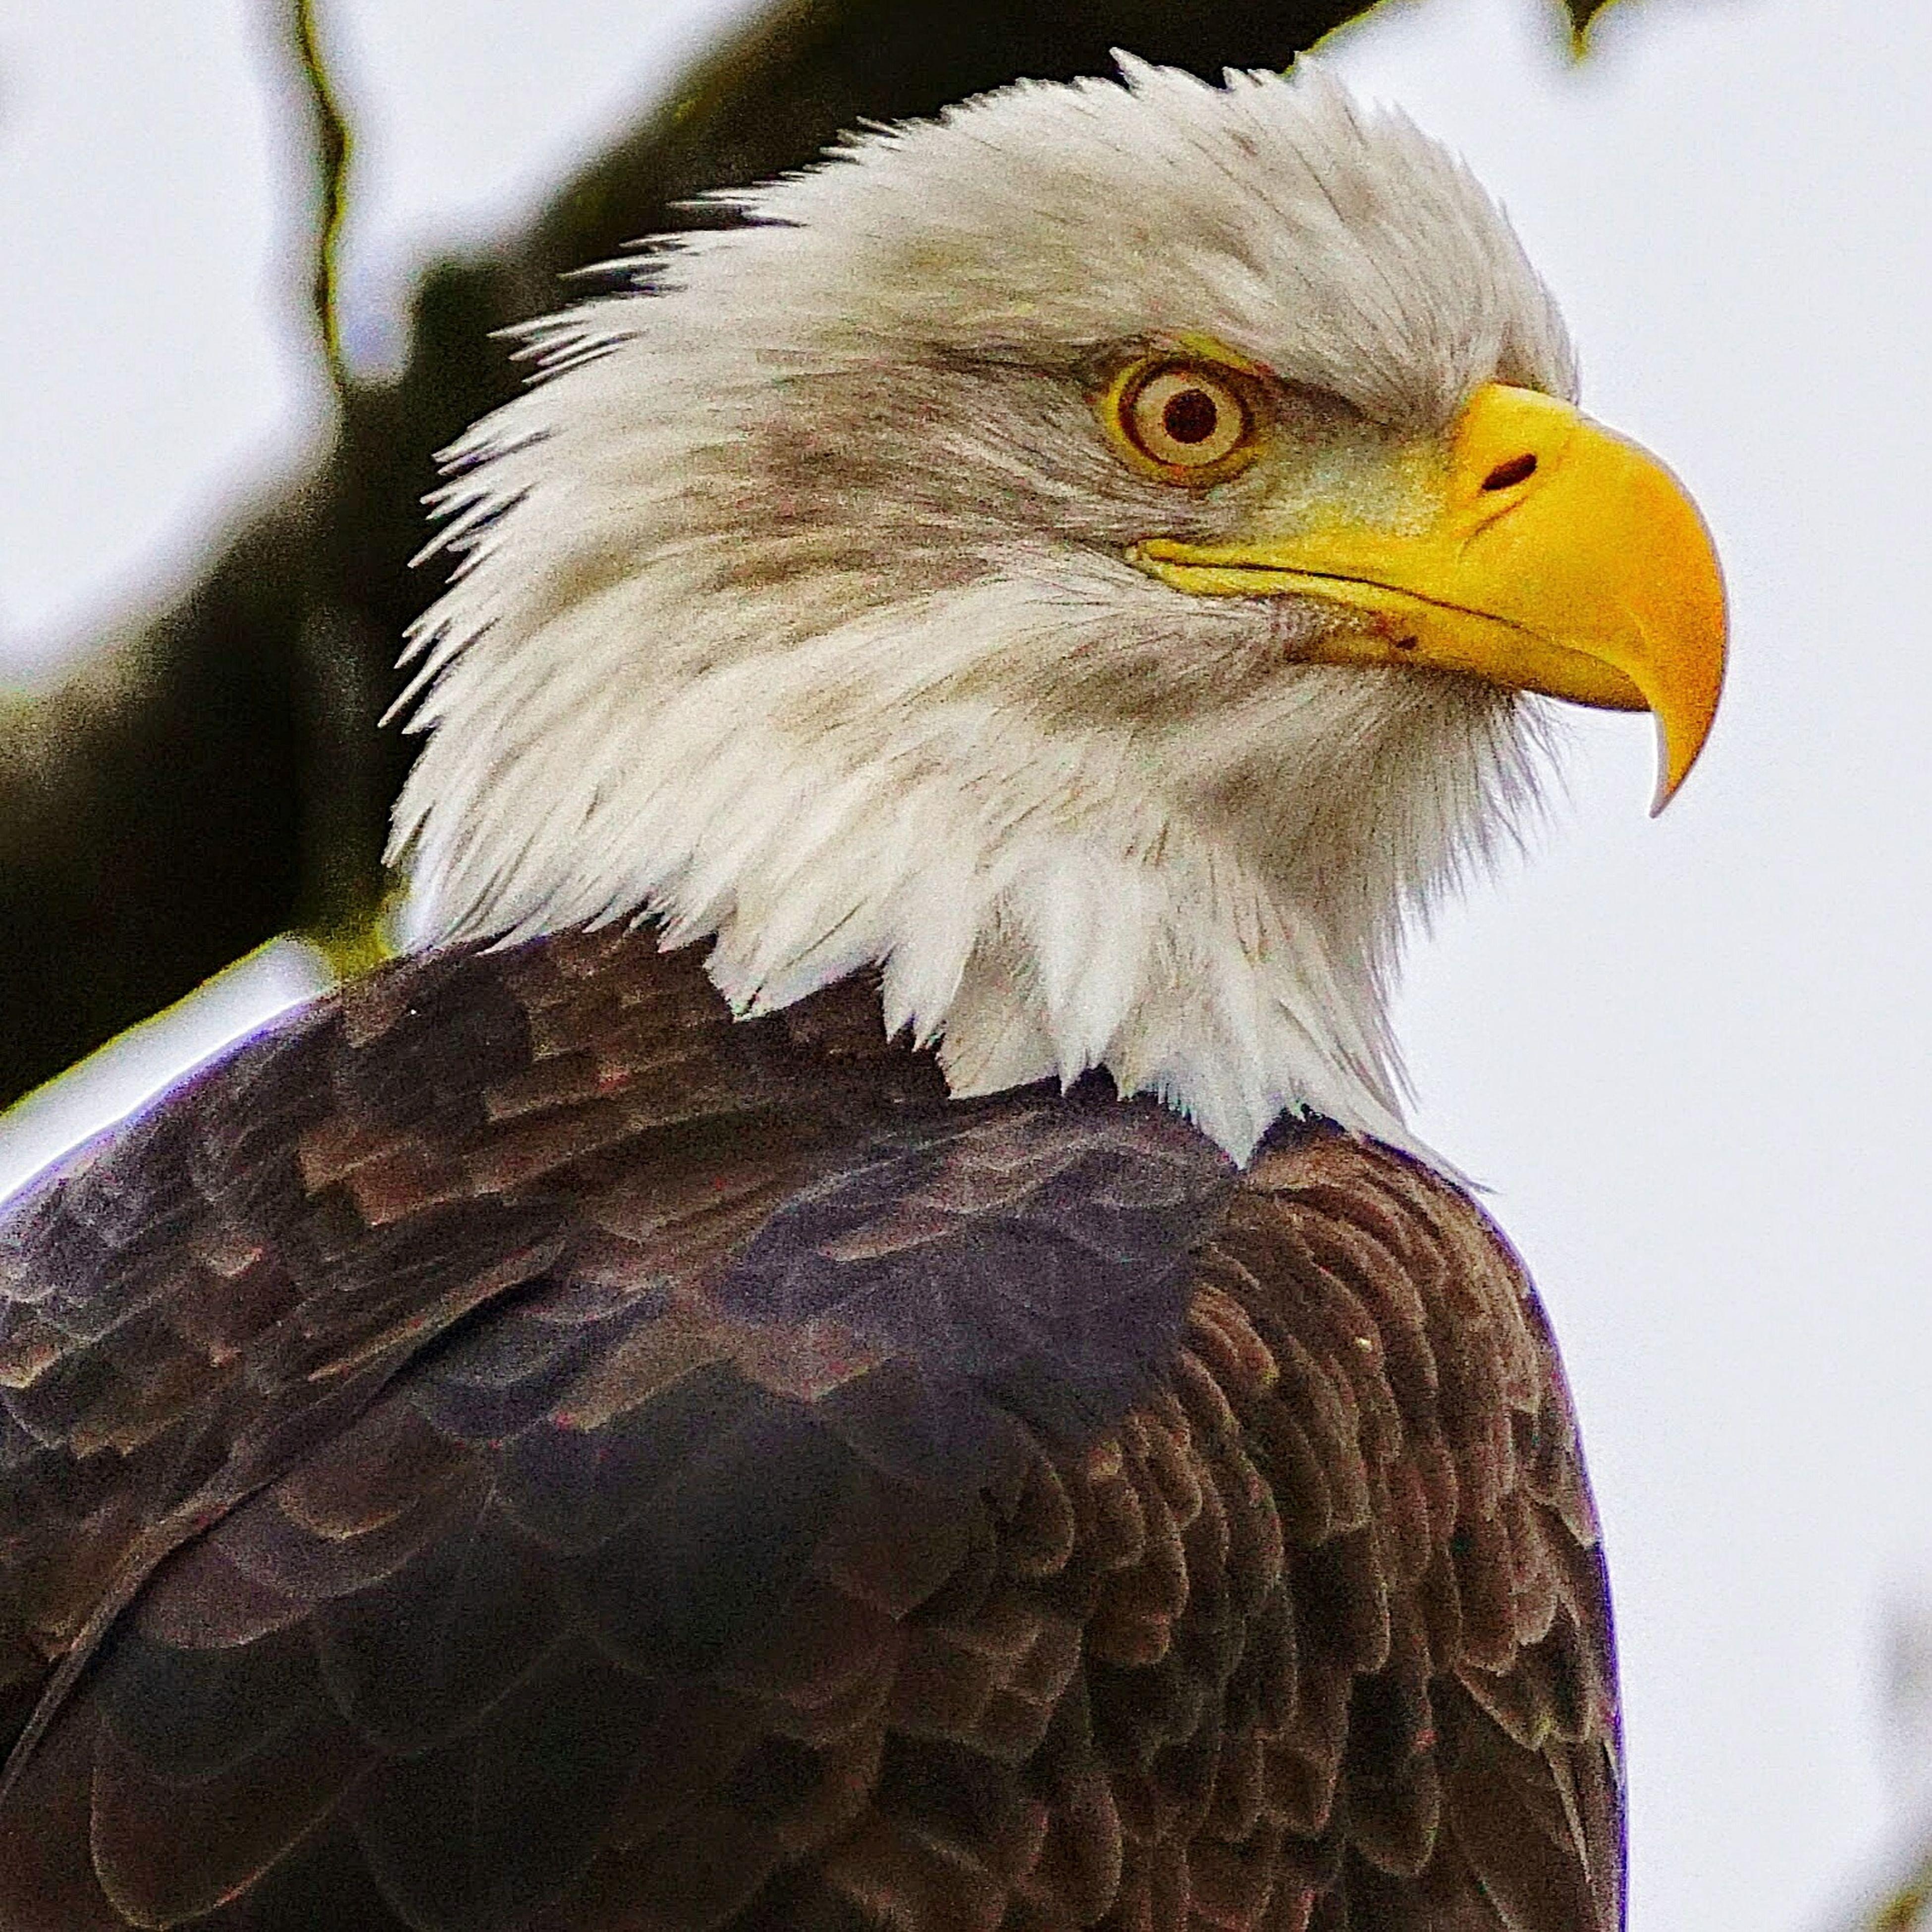 Nature Bald Eagle Eagle Beautiful Bc British Columbia Pretty Majestic Strong Bird